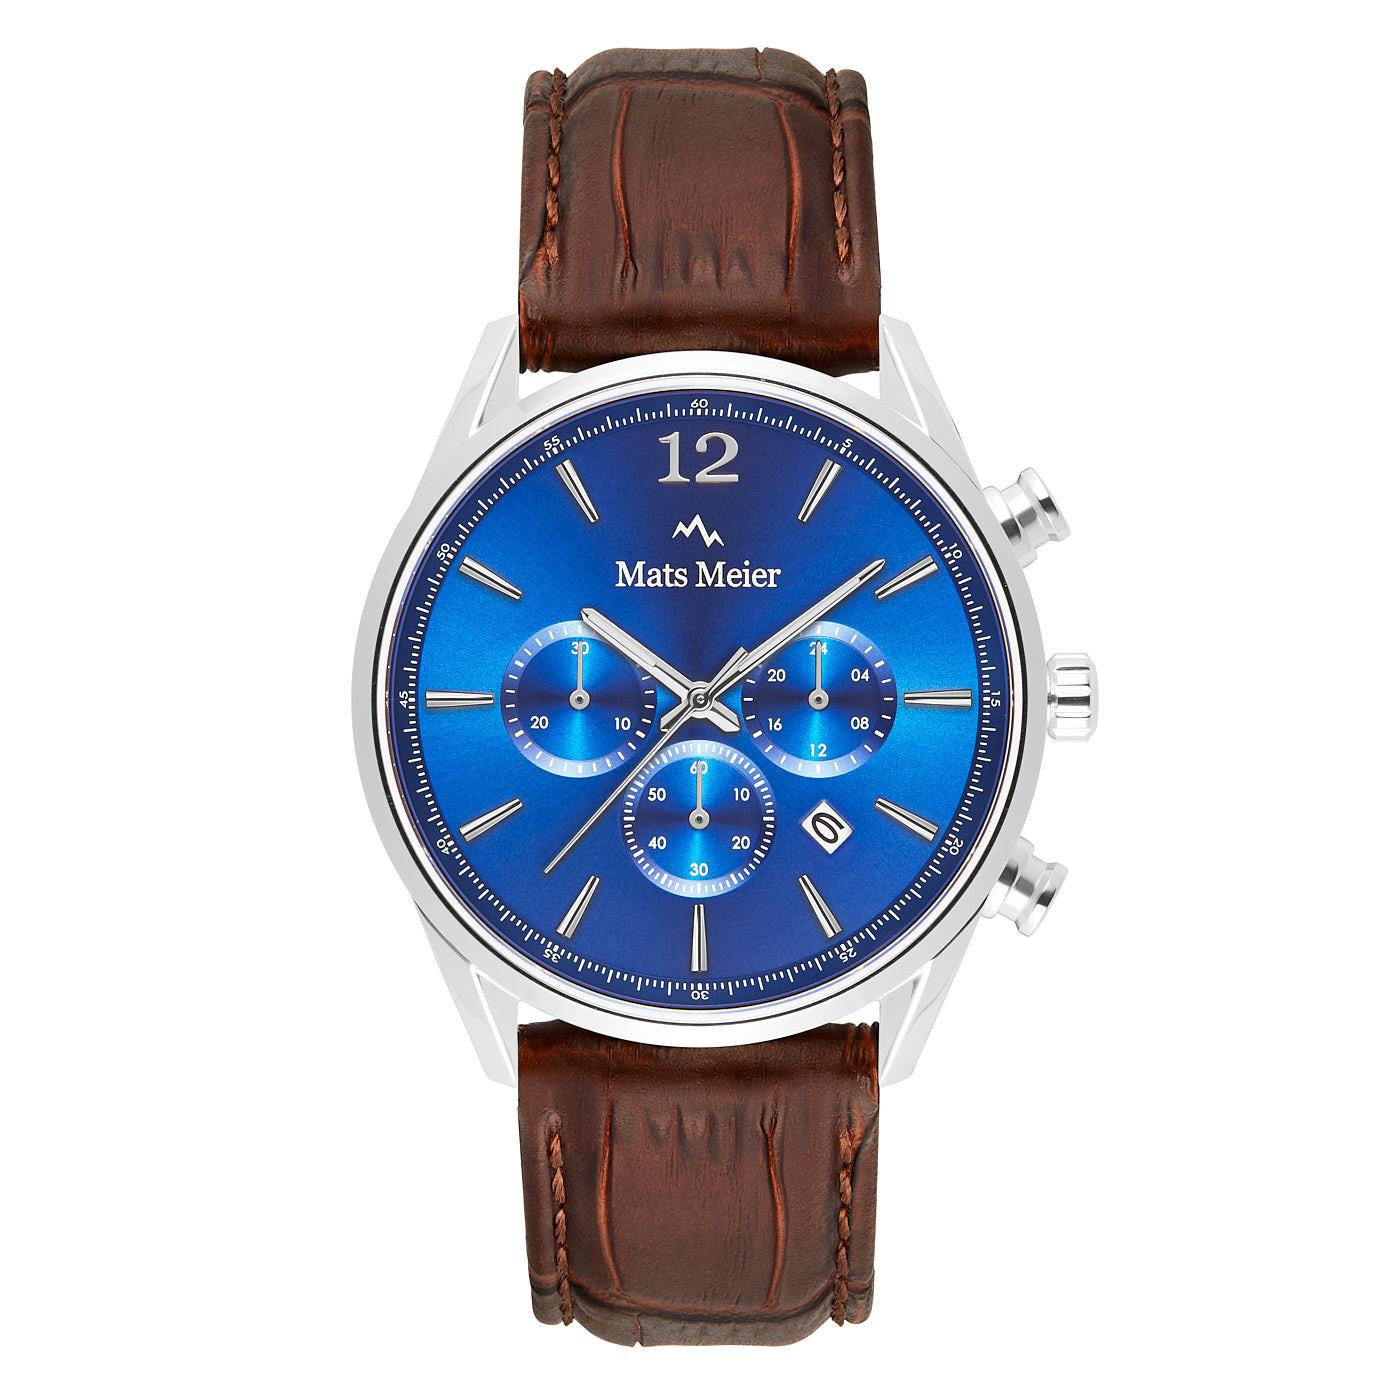 Mats Meier Grand Cornier kronografklocka blå/brun